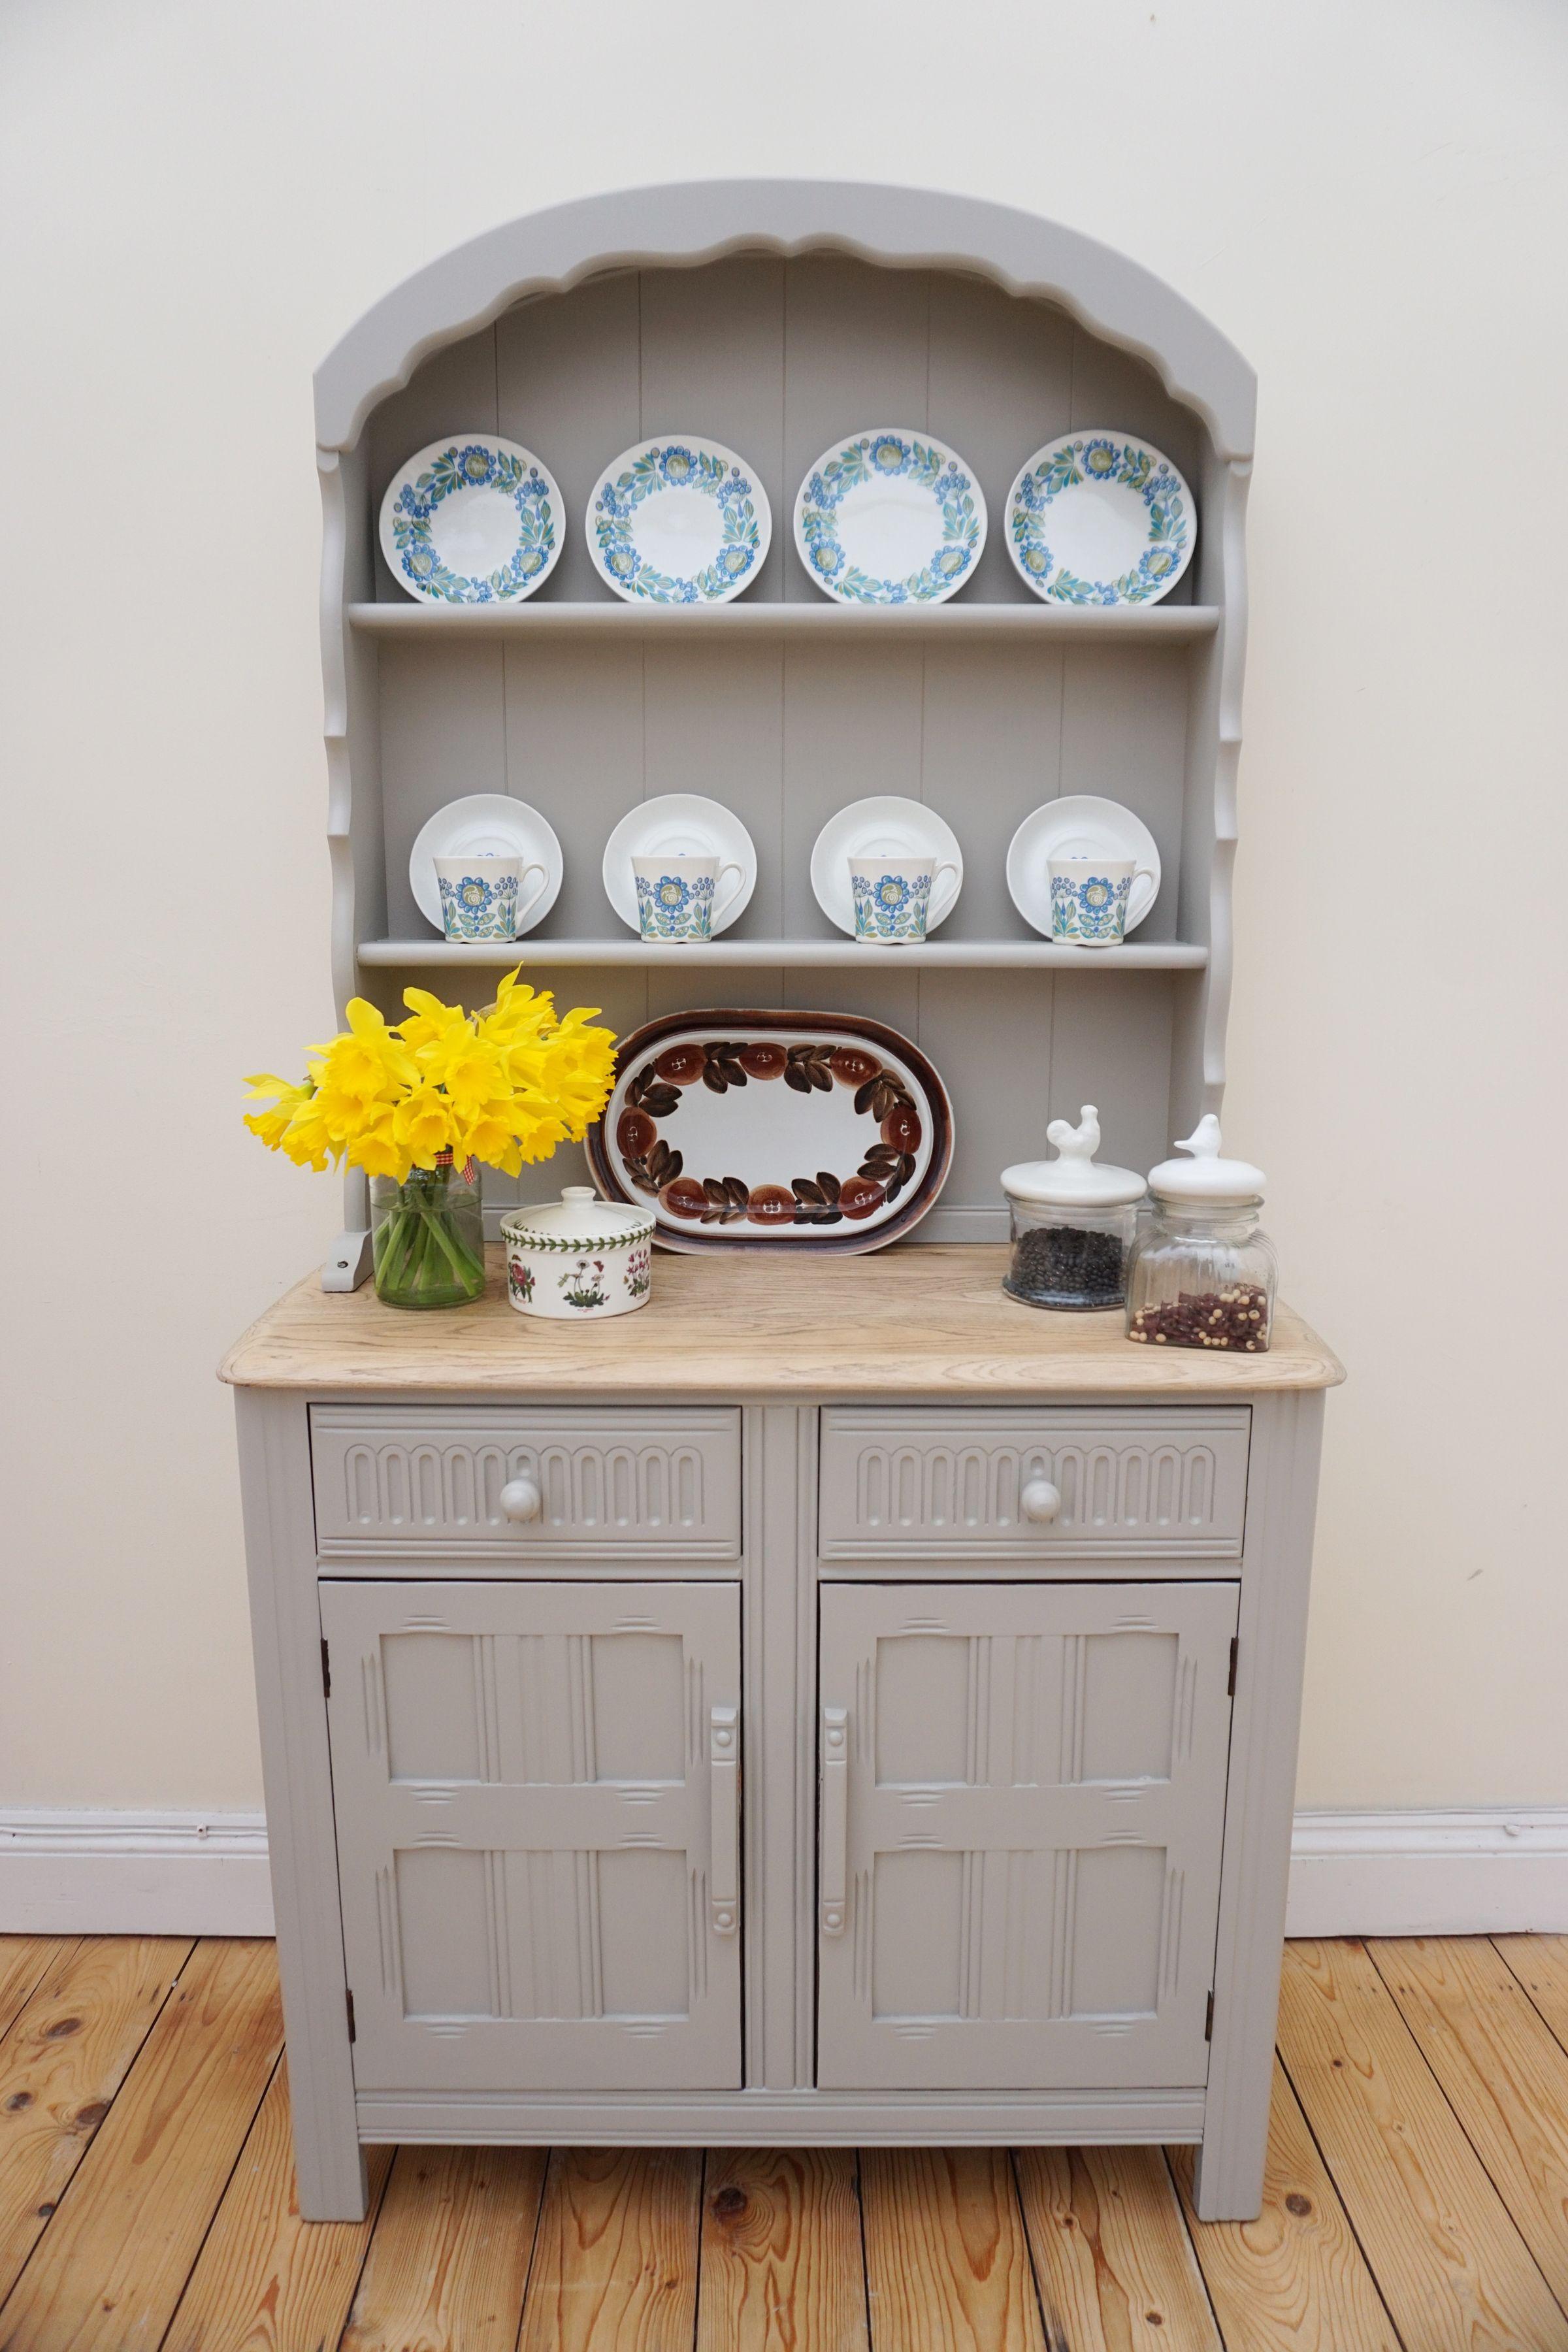 Priory Oak dresser has been restored by SALT LONDON Painted in